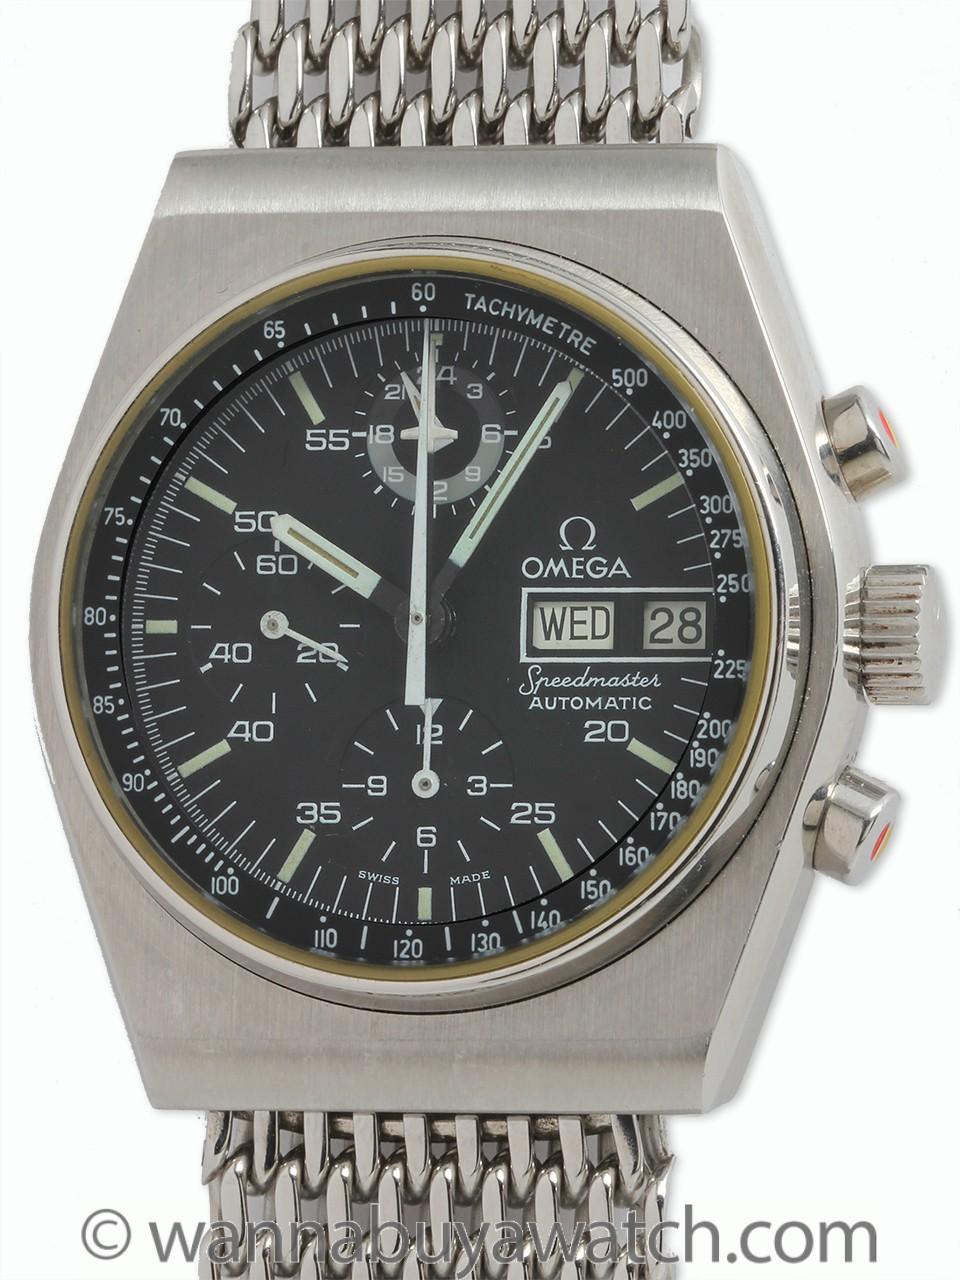 Omega Seamaster Chronograph circa 1970's